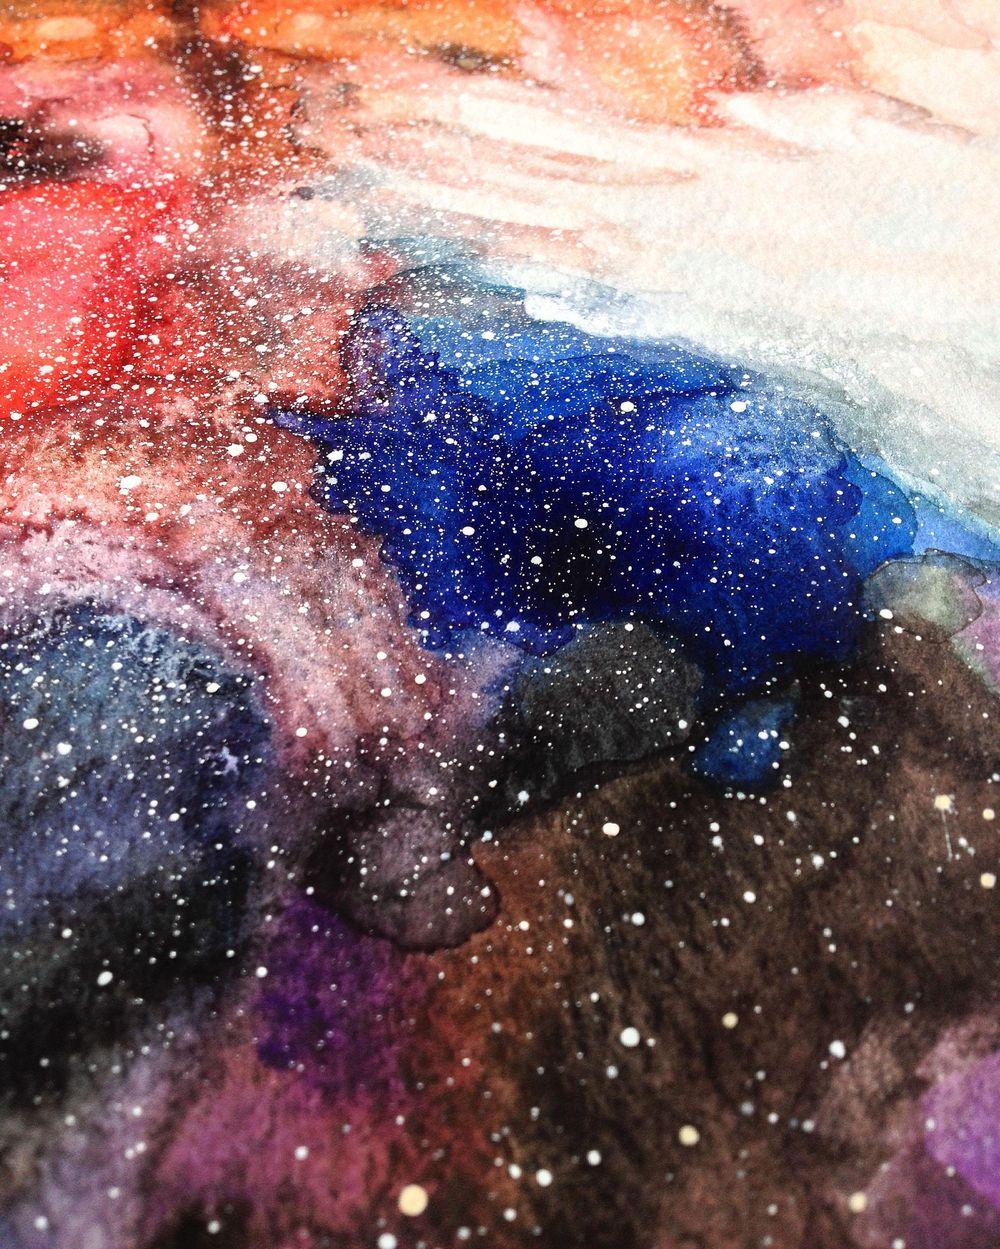 ☄ Watercolour Wonderland ☆ - image 11 - student project